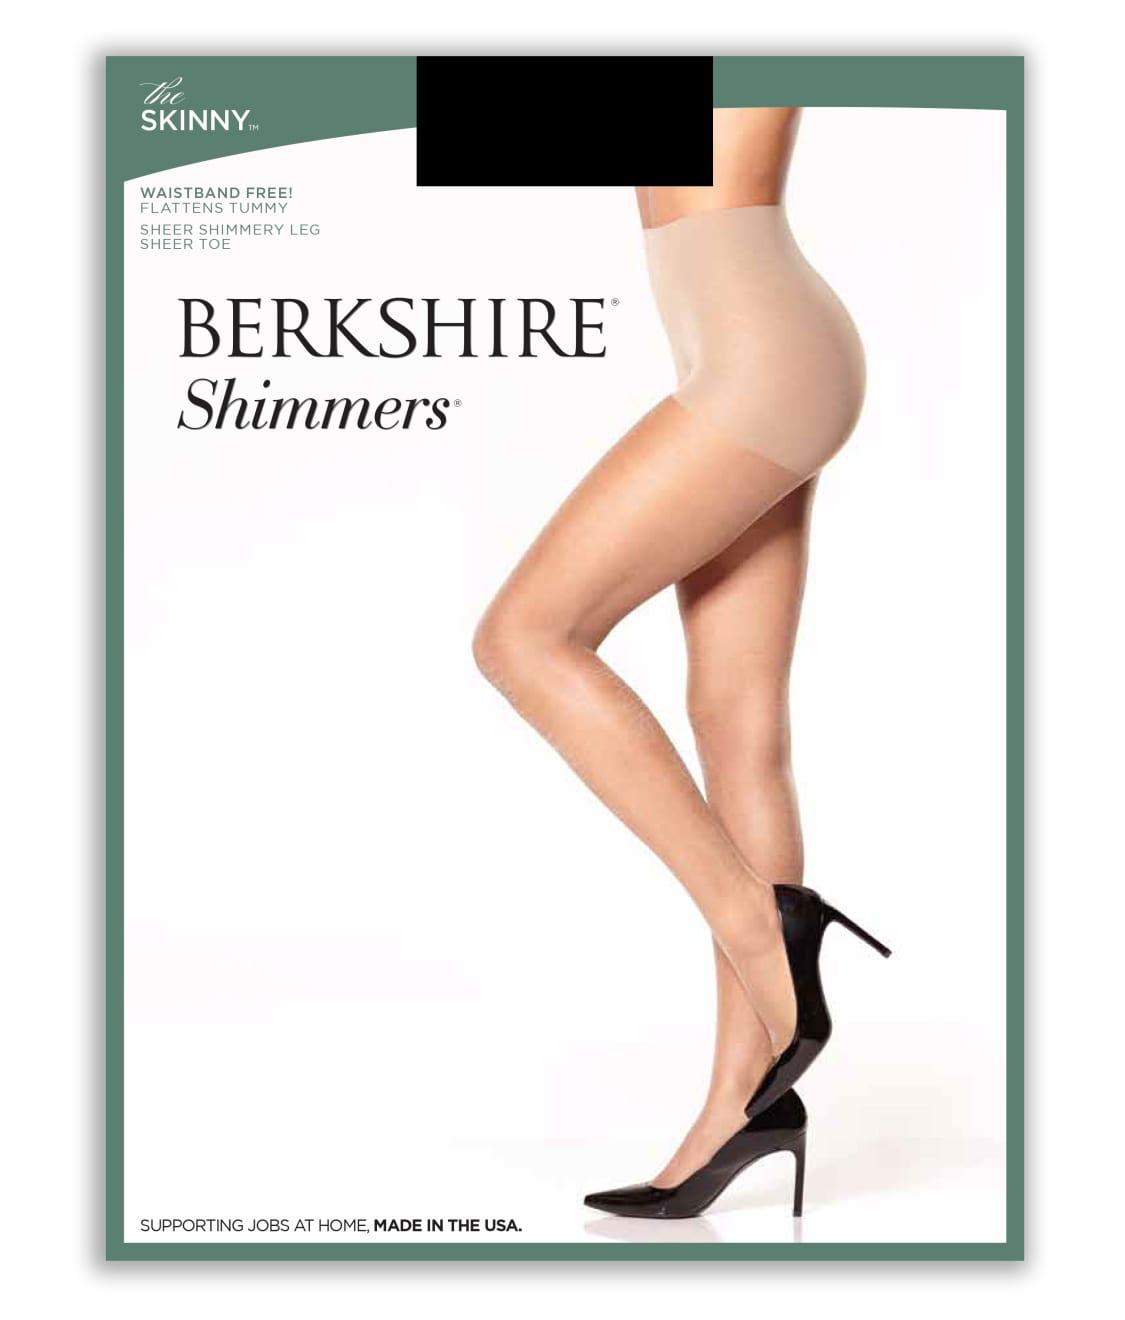 Berkshire Nylons Pantyhose Shimmers Flattens Tummy Sheer Shimmery Leg #5019 NEW